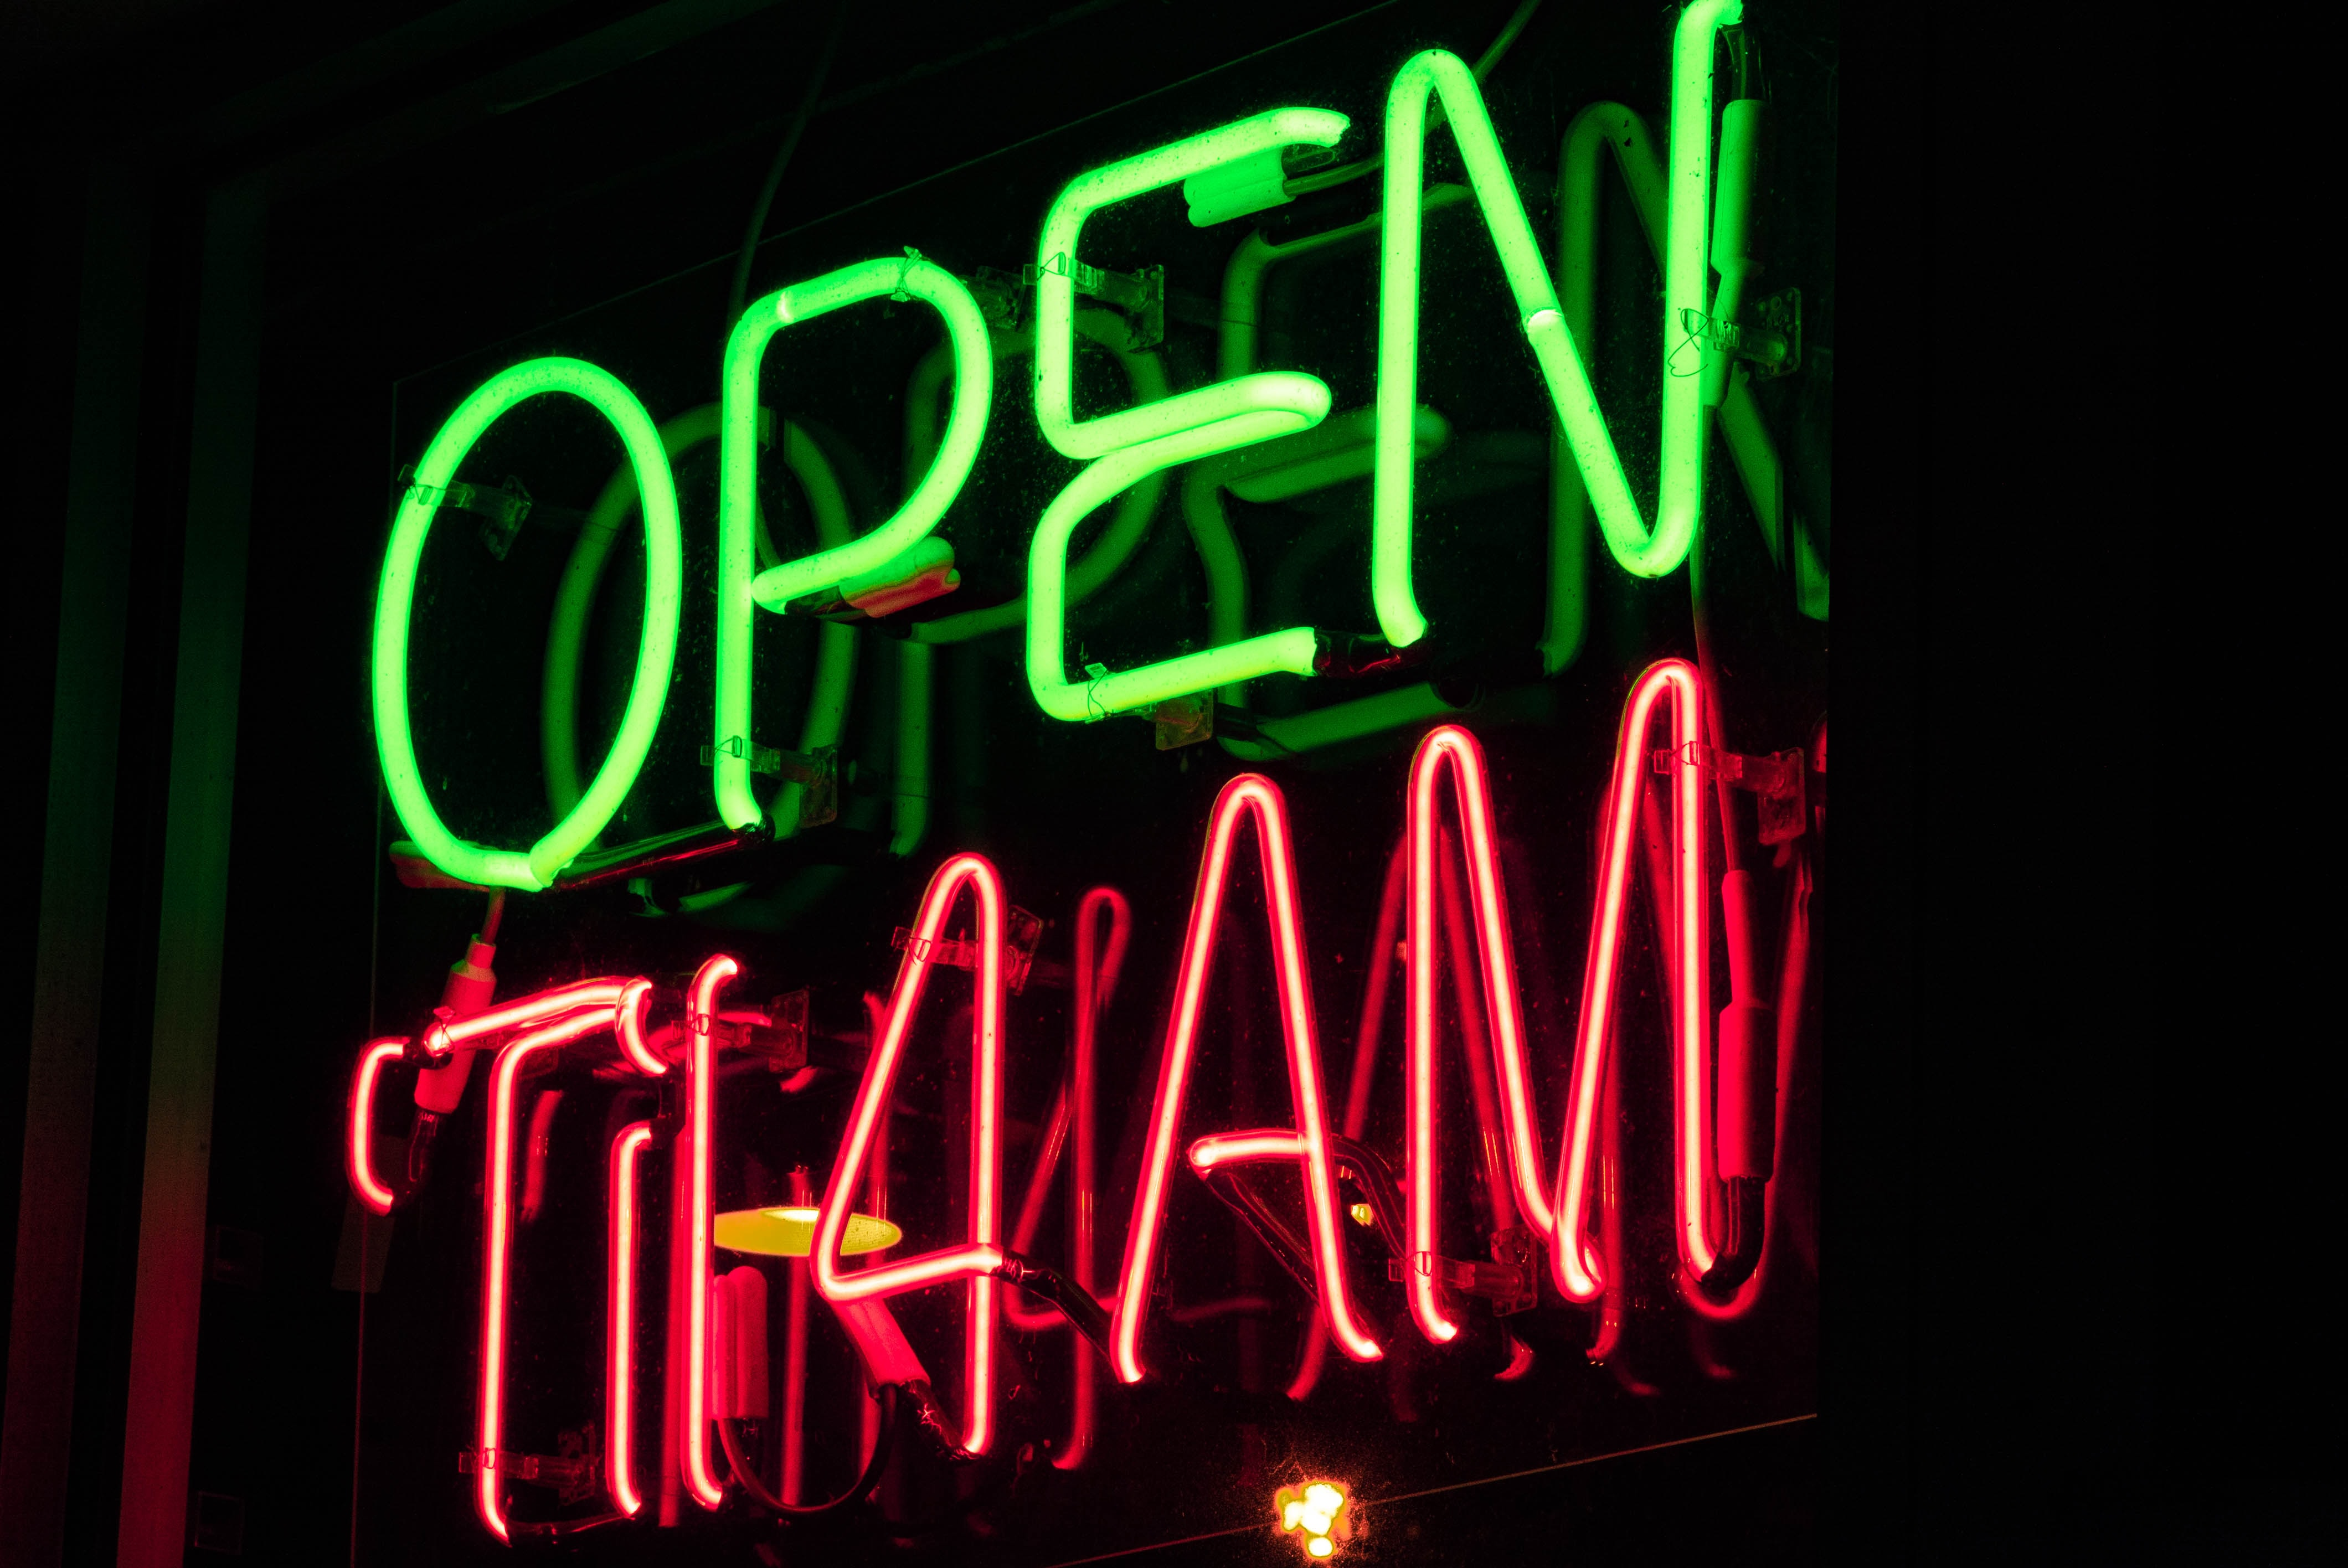 low-light photo of open til 4 AM neon sign